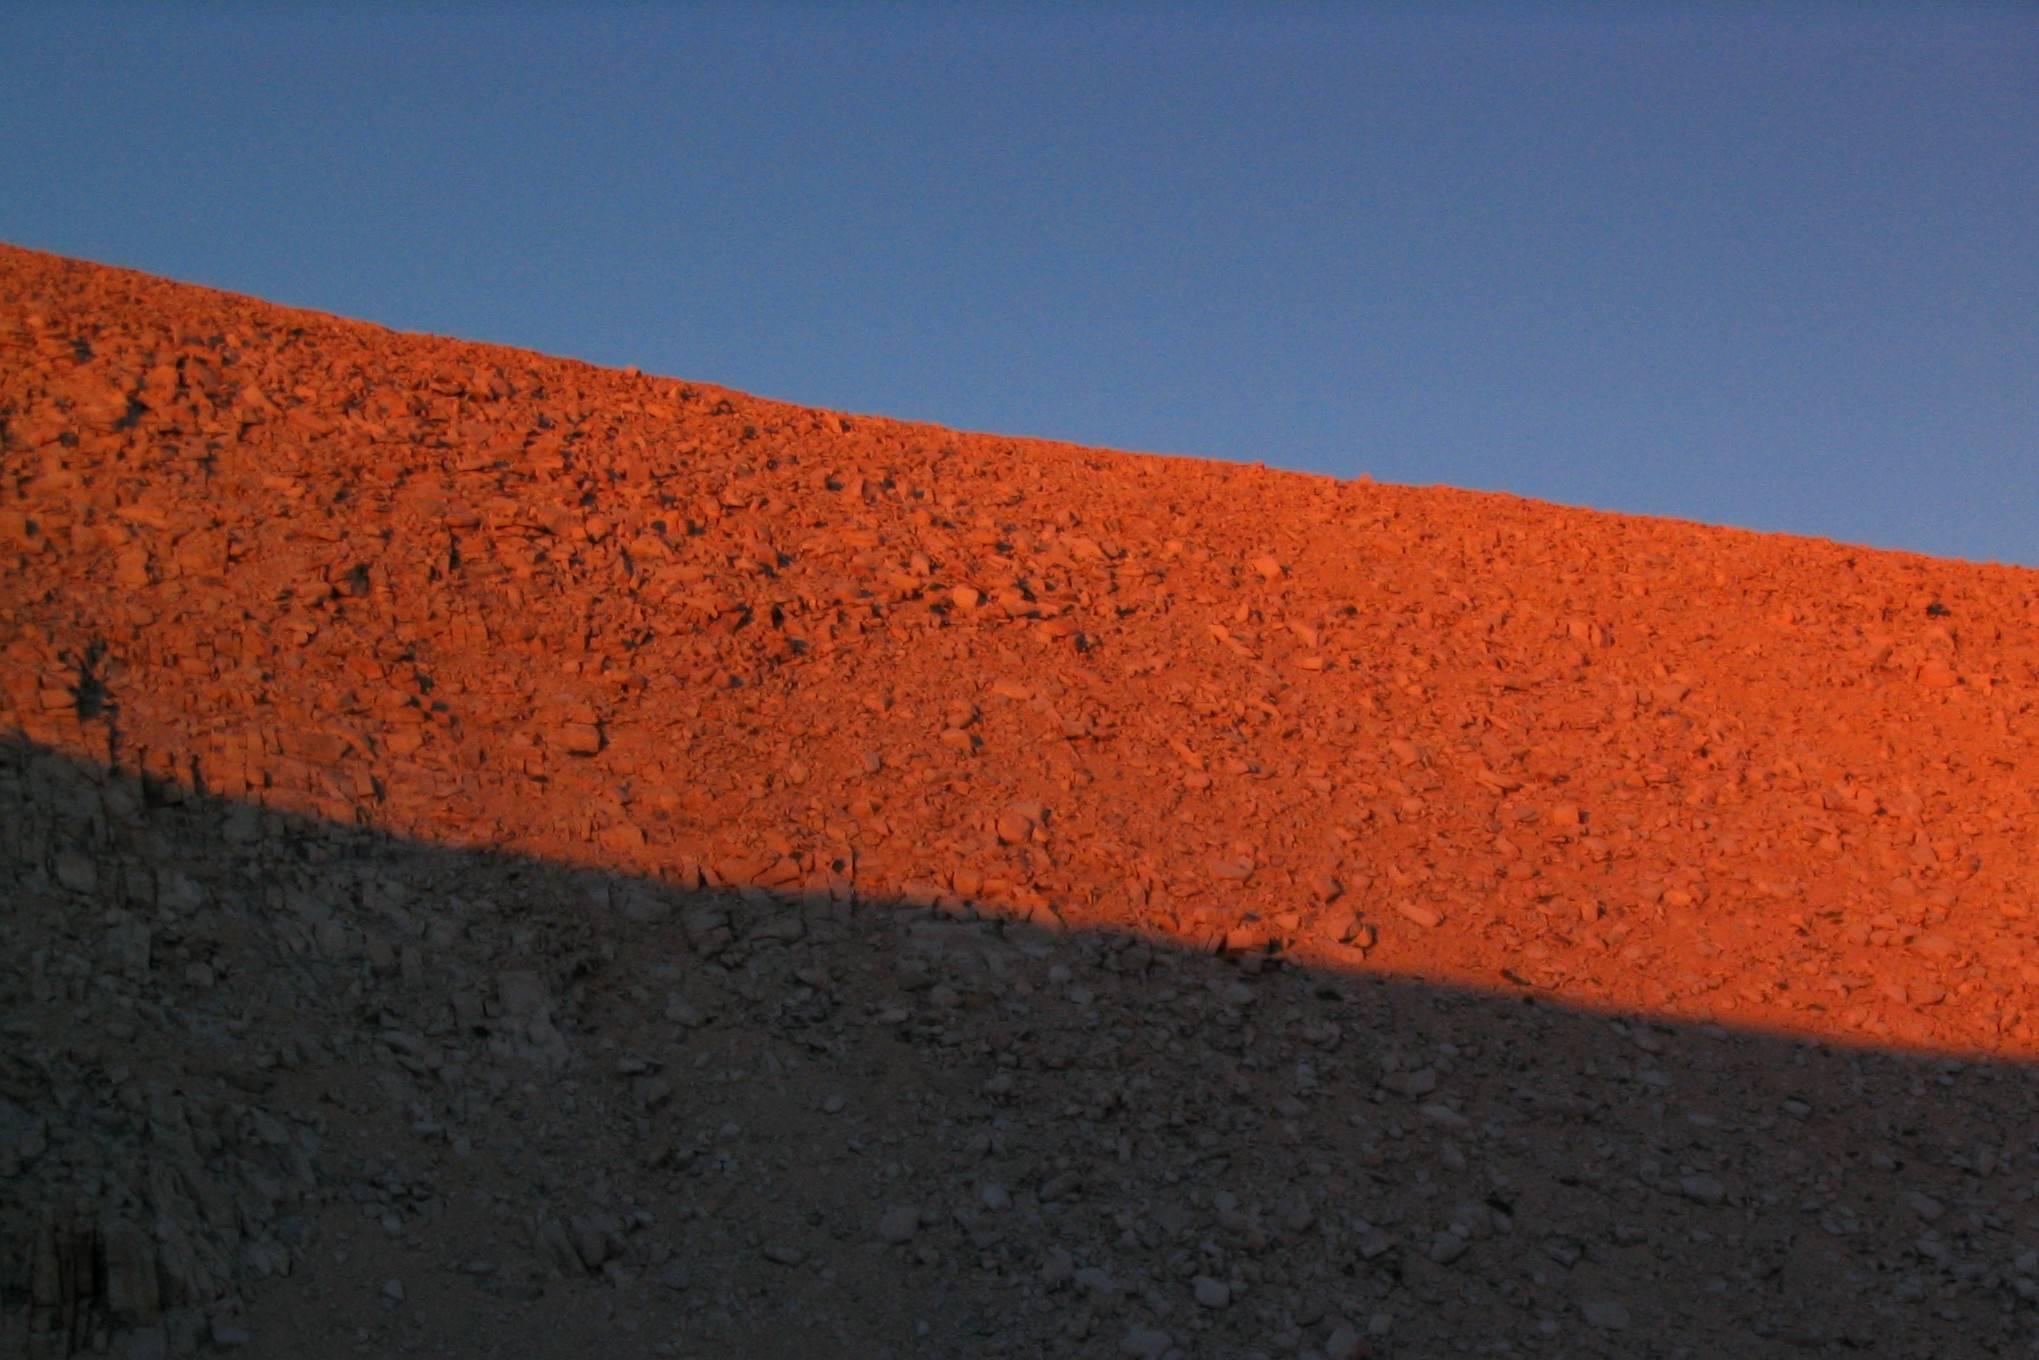 Sunset color bands on ridgeline